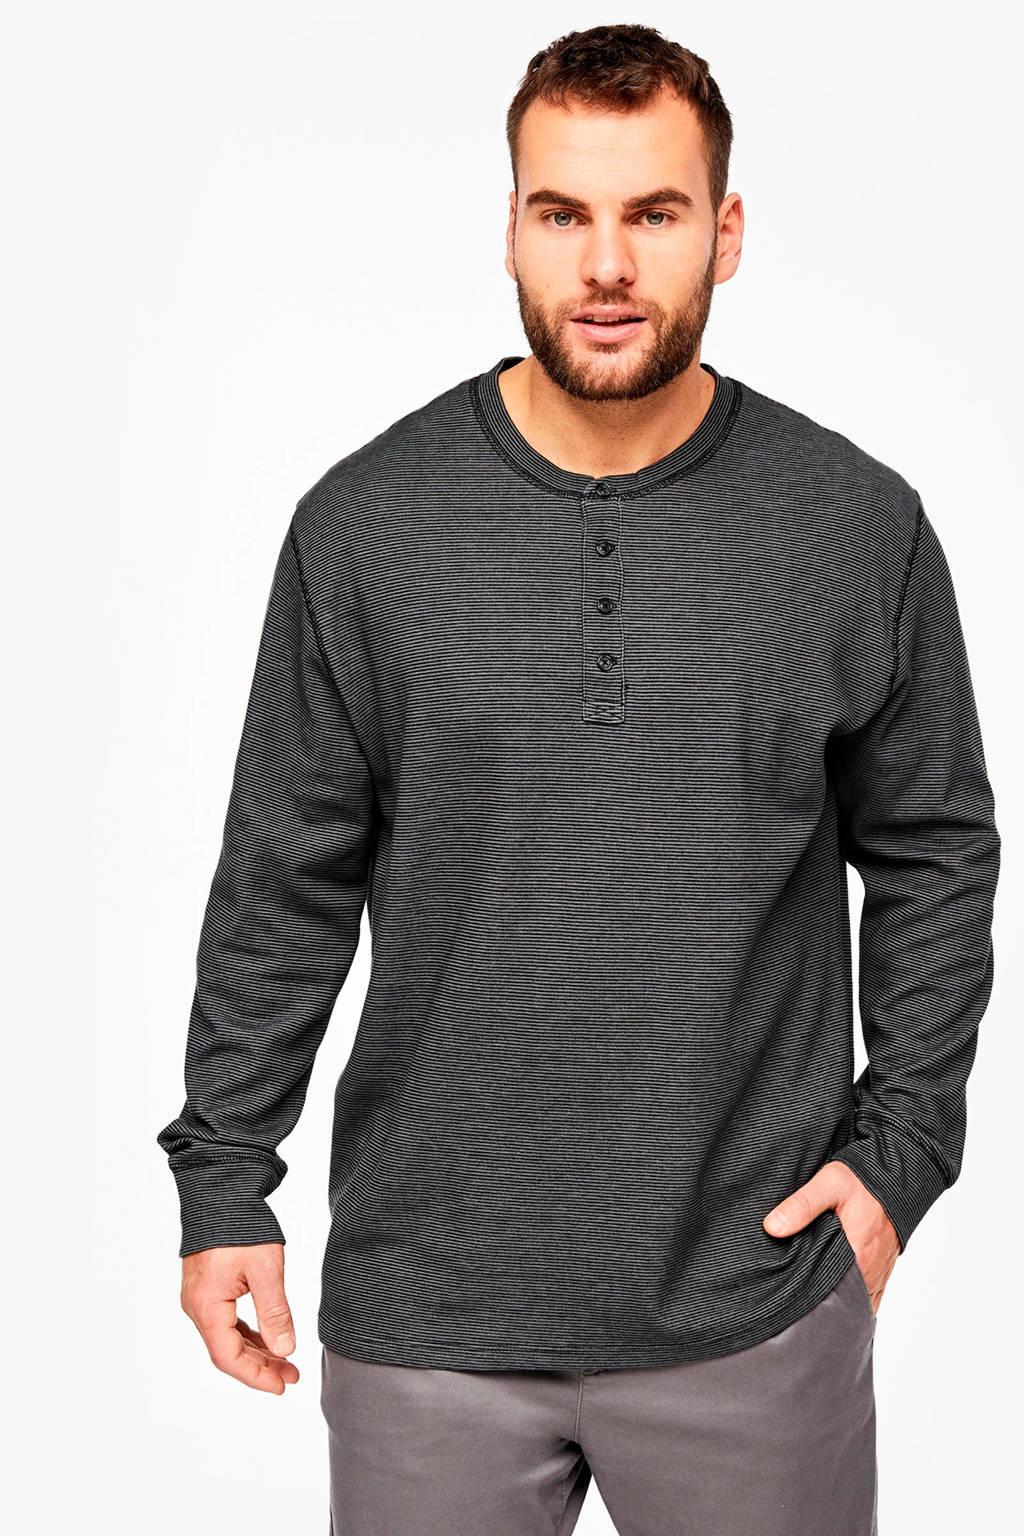 s.Oliver Big Size gestreept T-shirt zwart/grijs Big size, Zwart/grijs